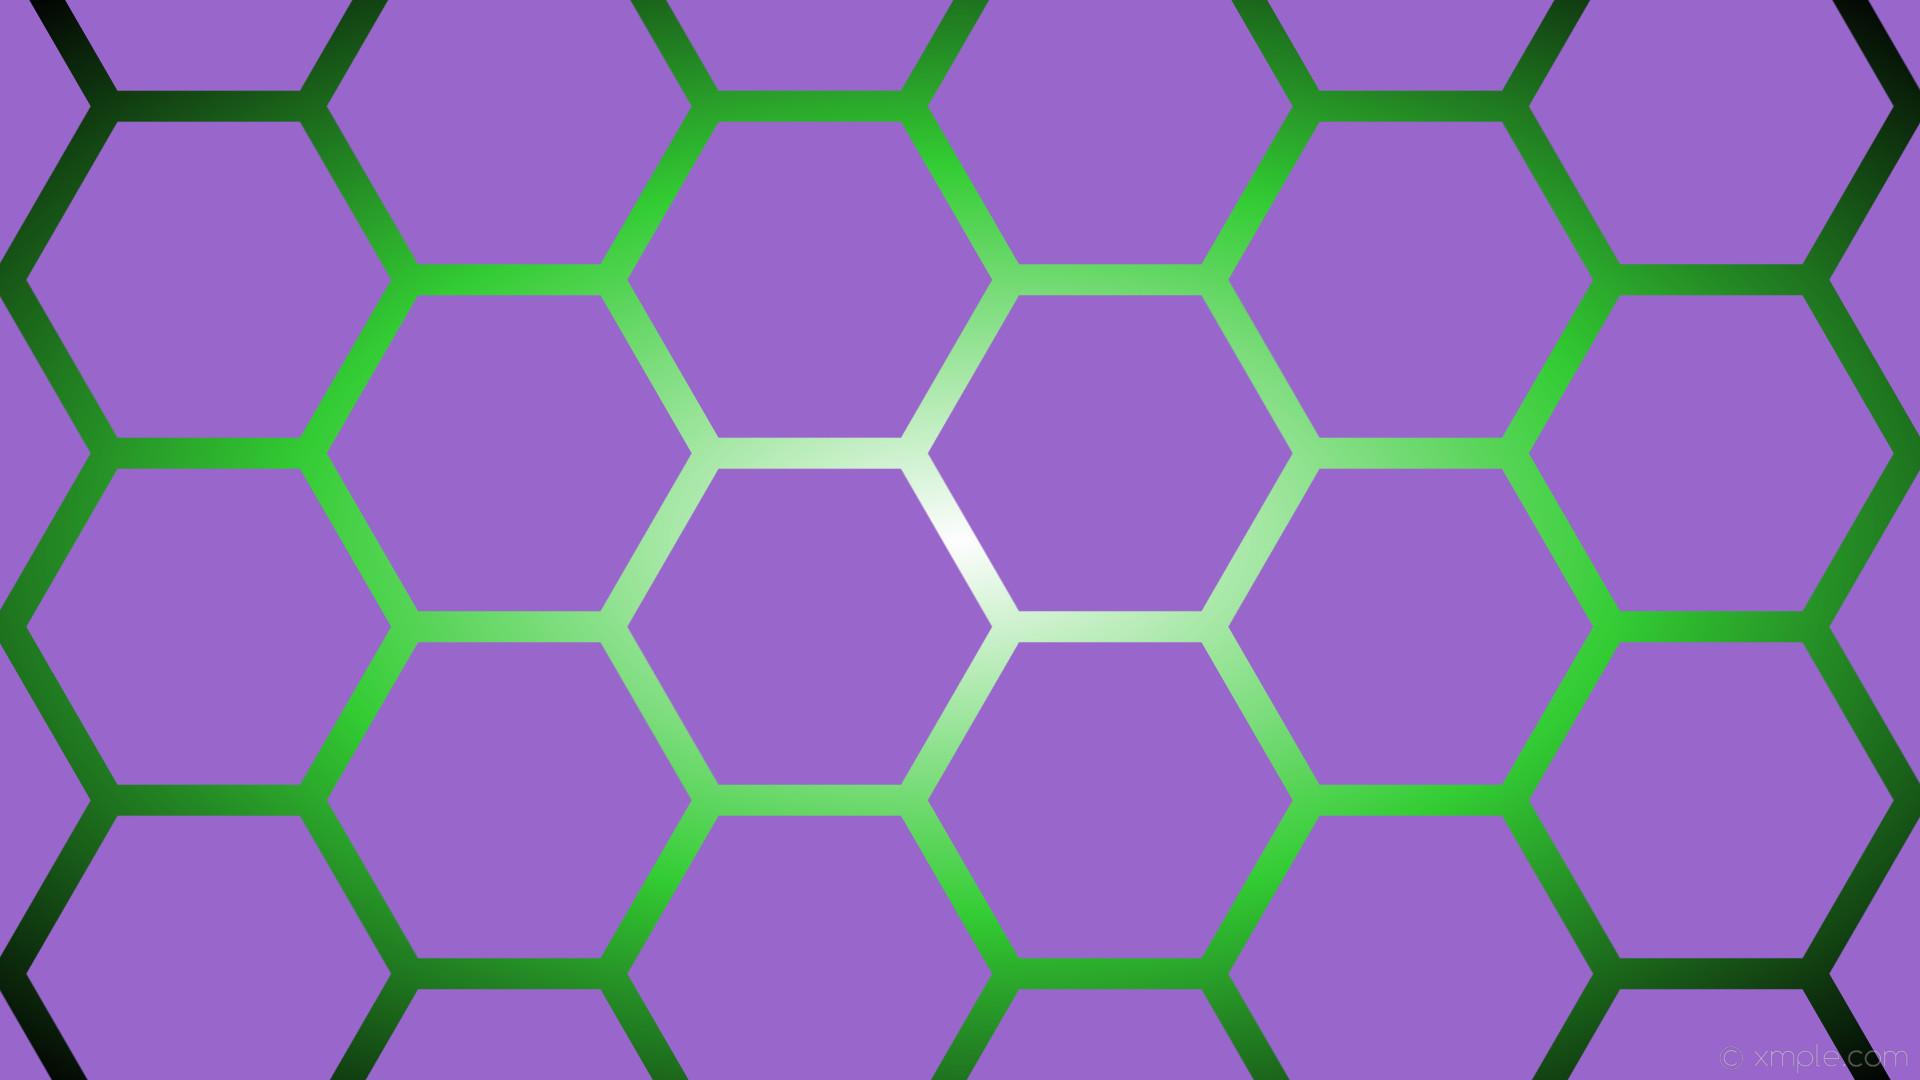 wallpaper glow gradient green hexagon white black purple amethyst lime green  #9966cc #ffffff #